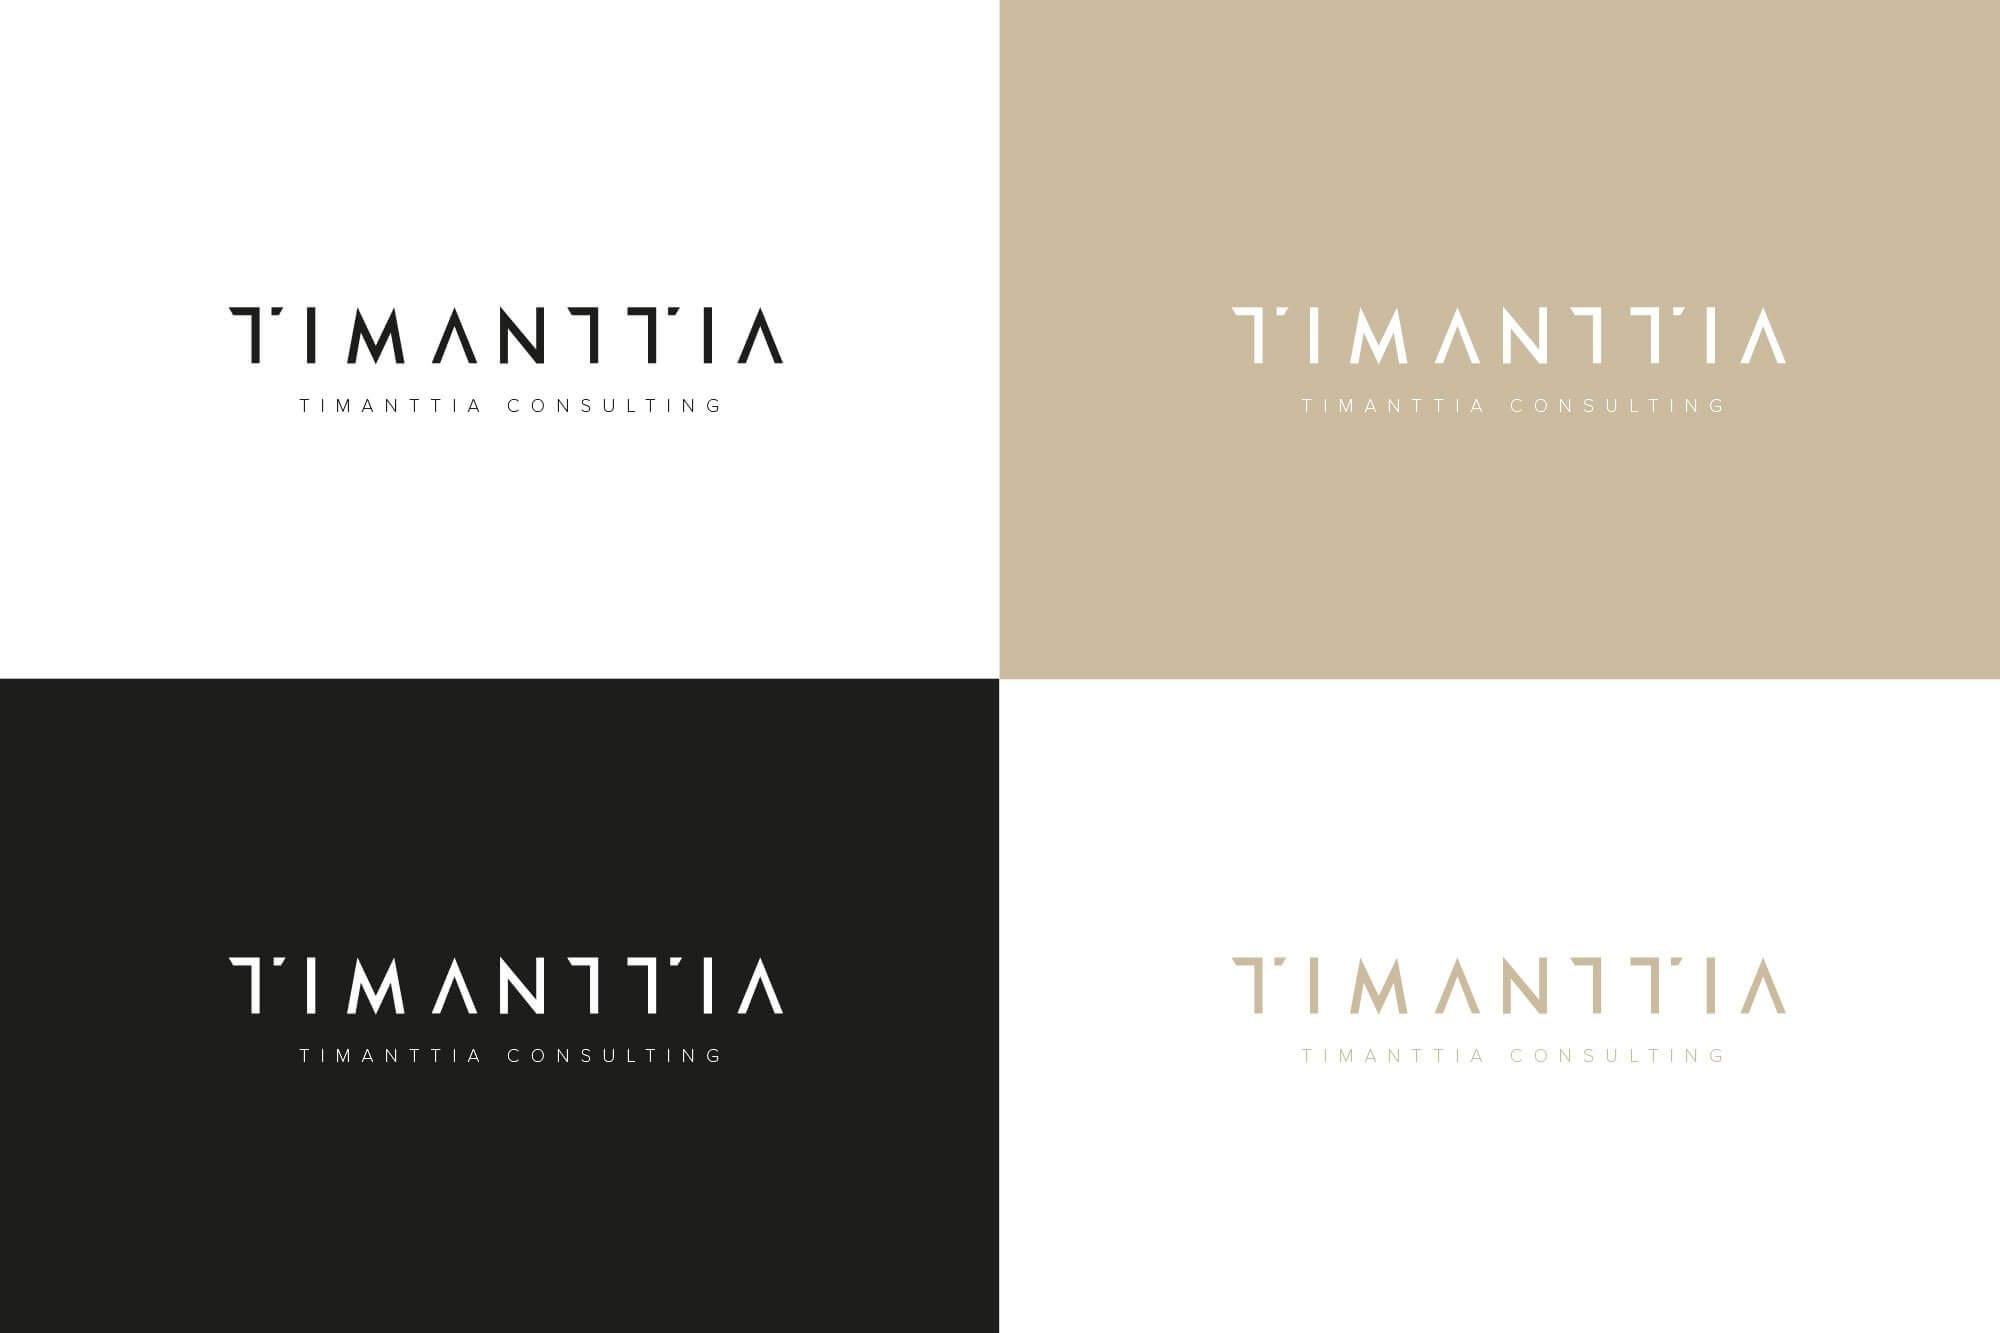 Timanttia logo